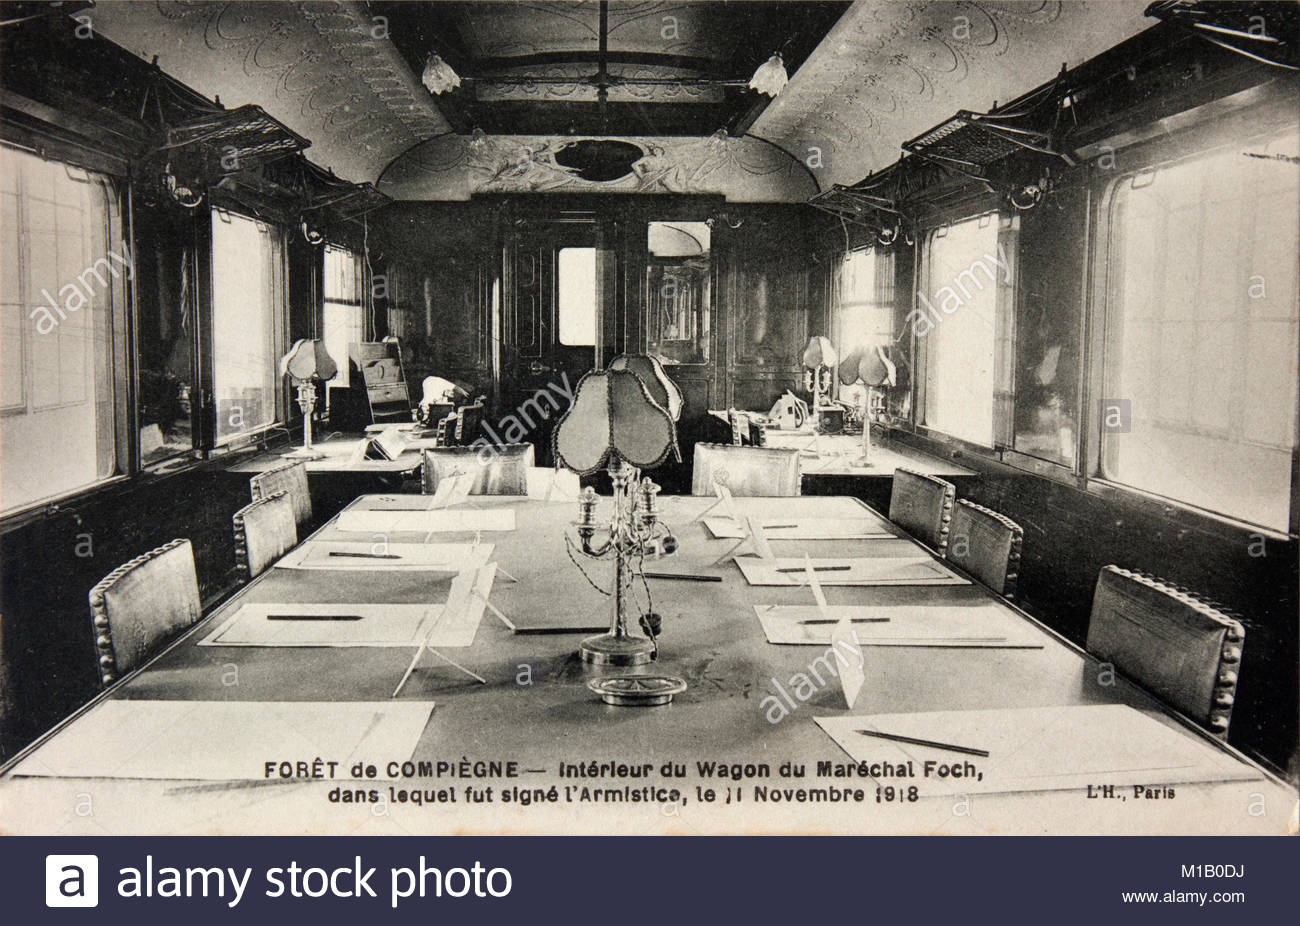 original-french-postcard-showing-the-wagon-in-which-the-ww1-armistice-M1B0DJ